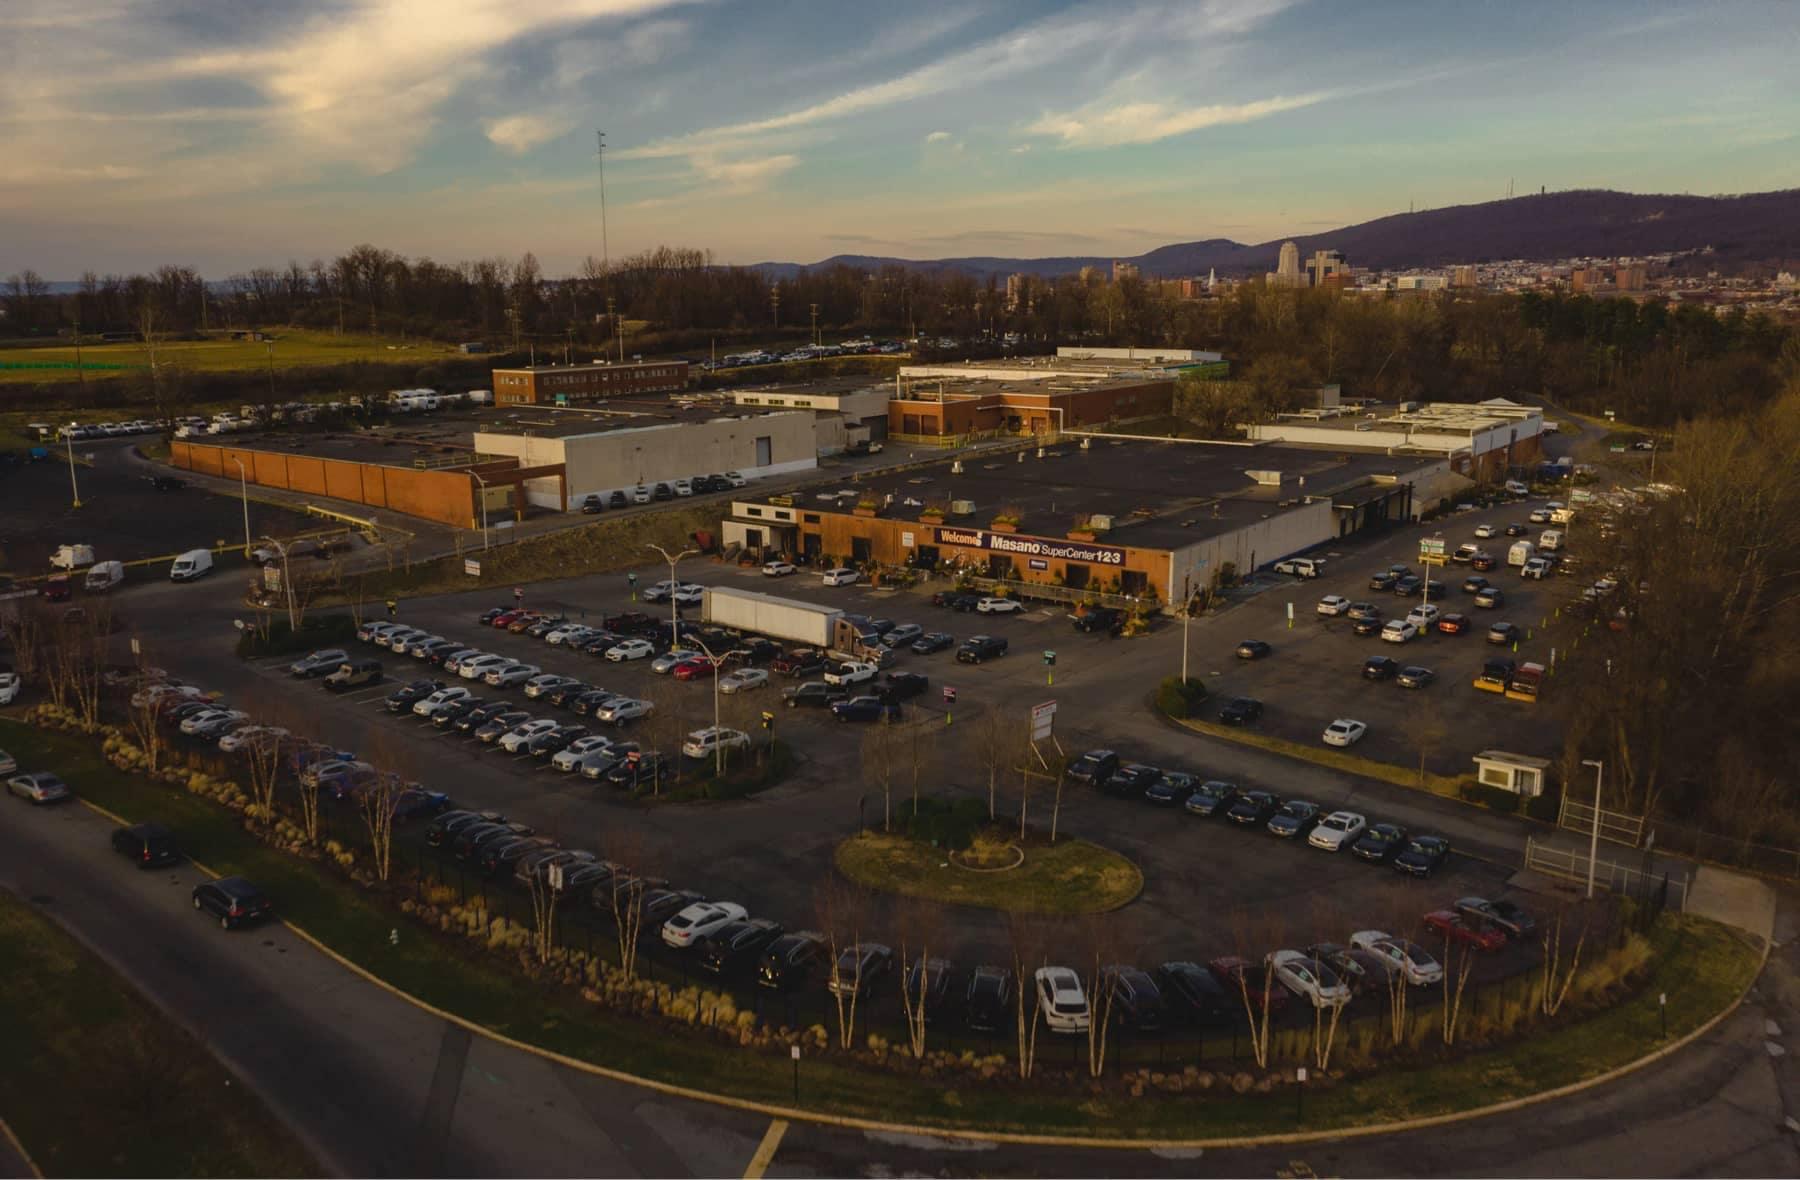 Aerial shot of Tom Masano Auto Park